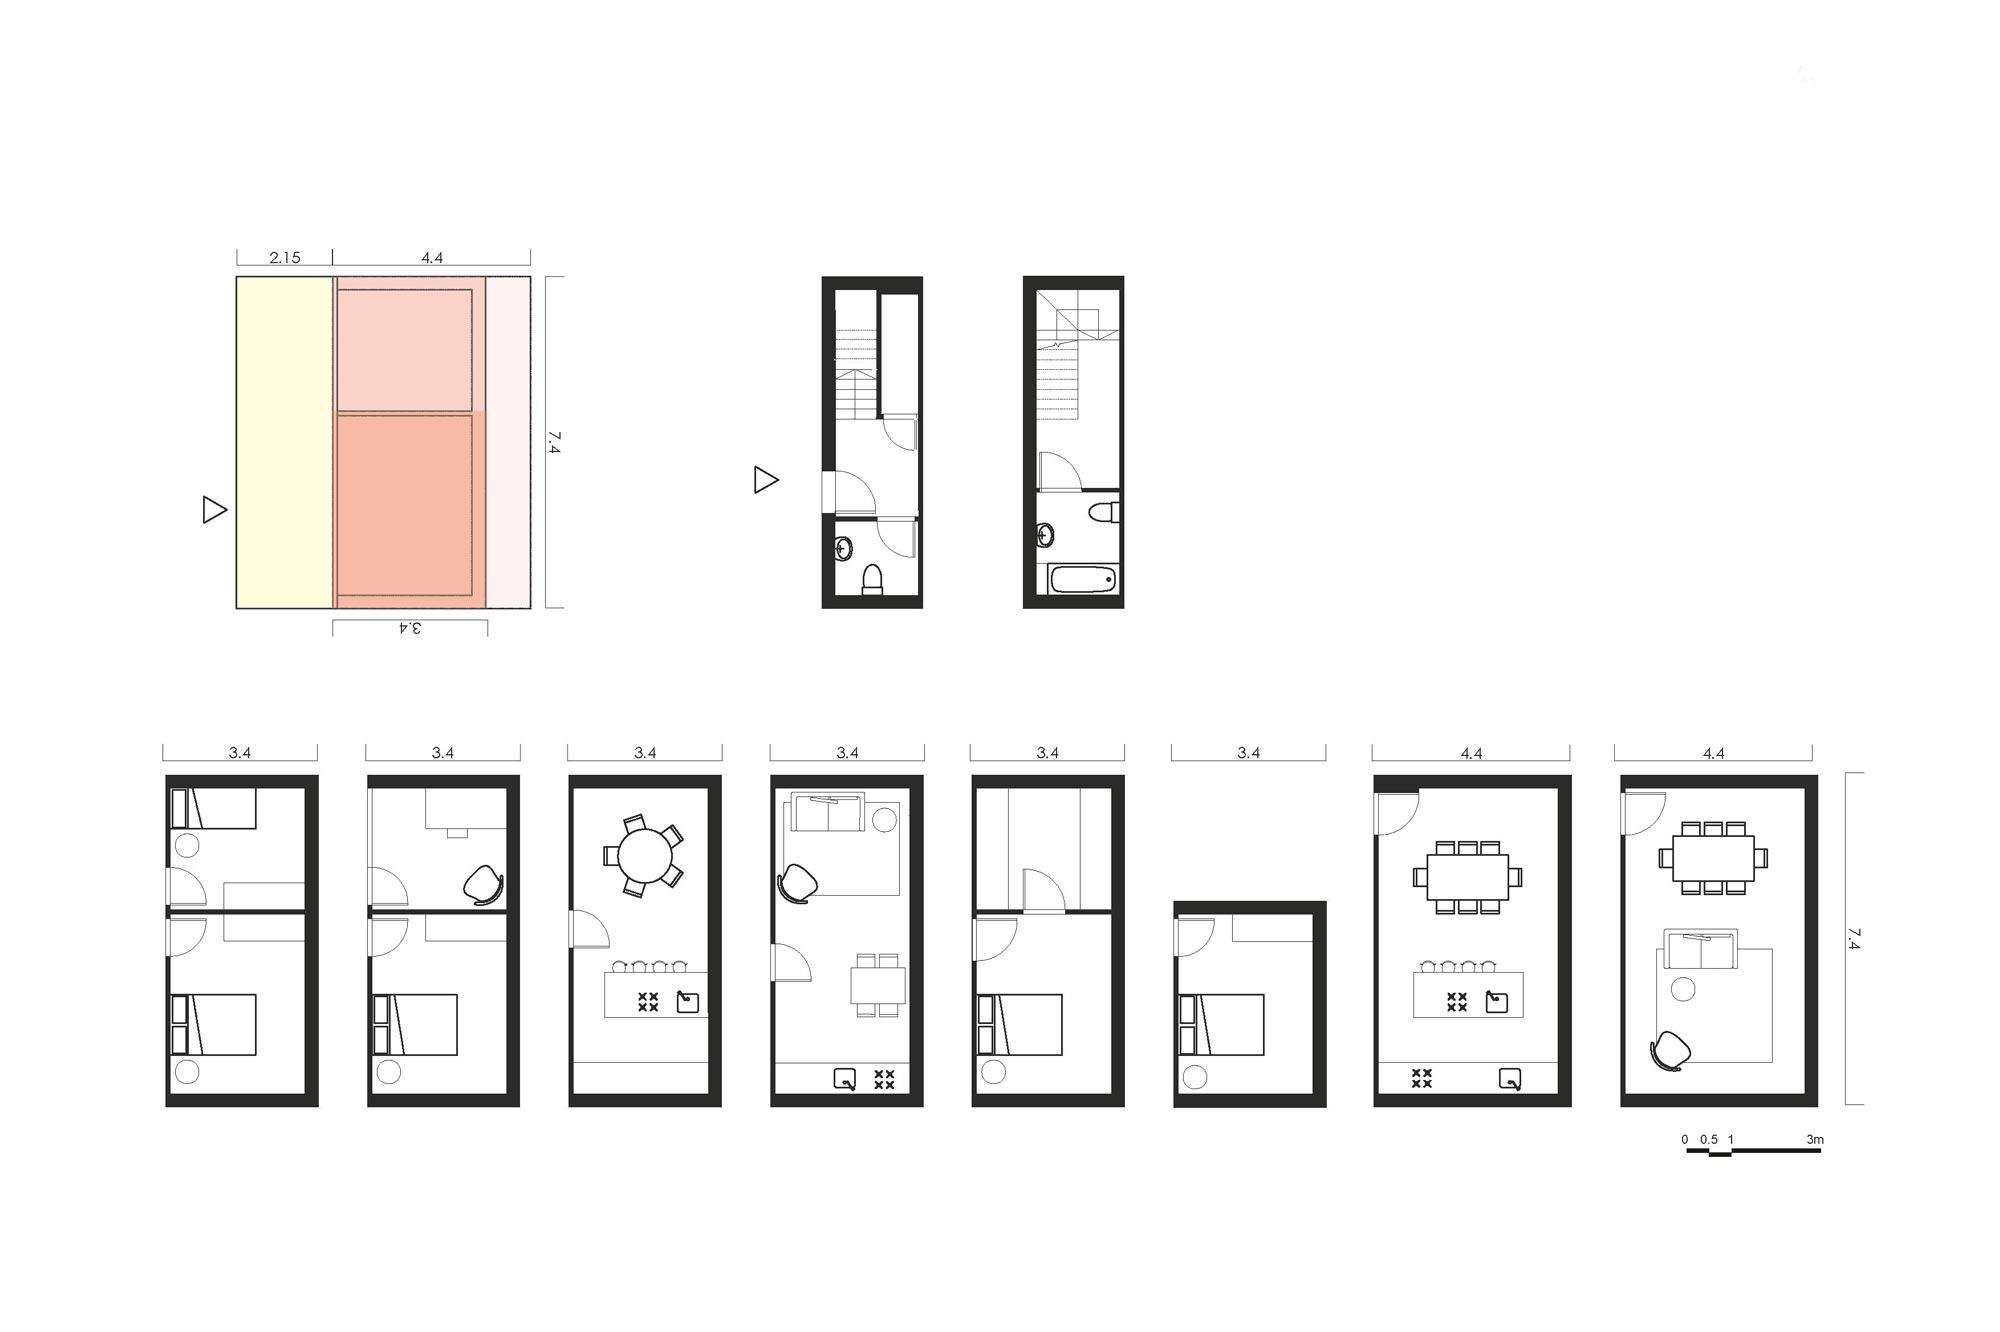 cube-haus-adjaye-associates-architects-cs-2000px-10